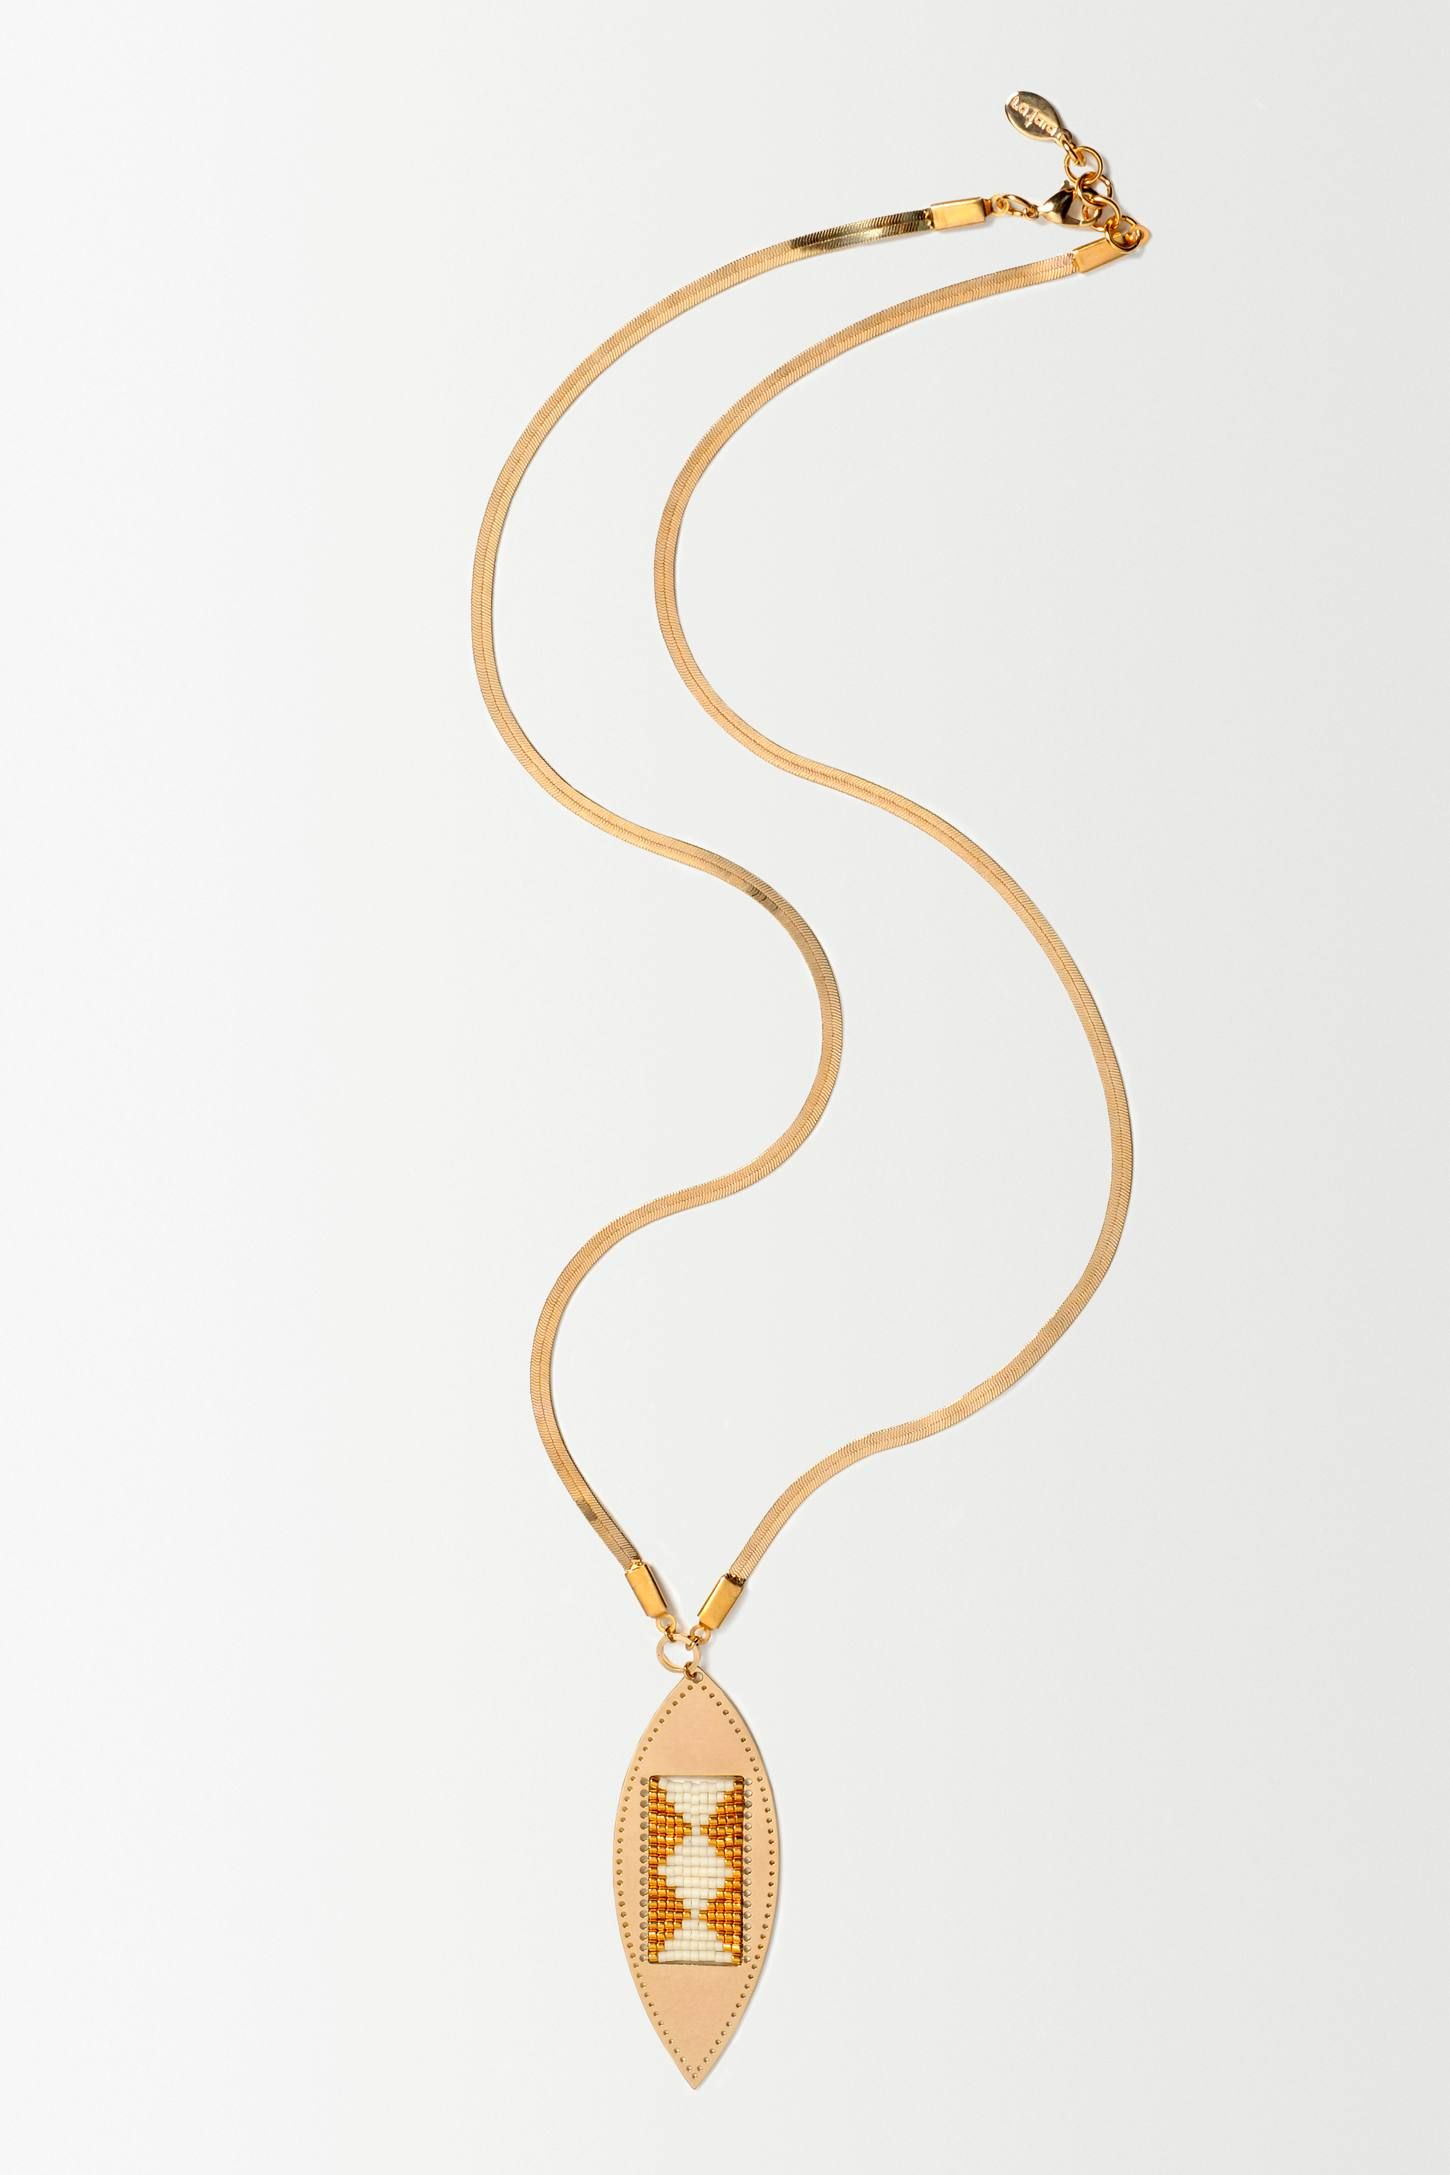 Arrow Weave Necklace - anthropologie.eu